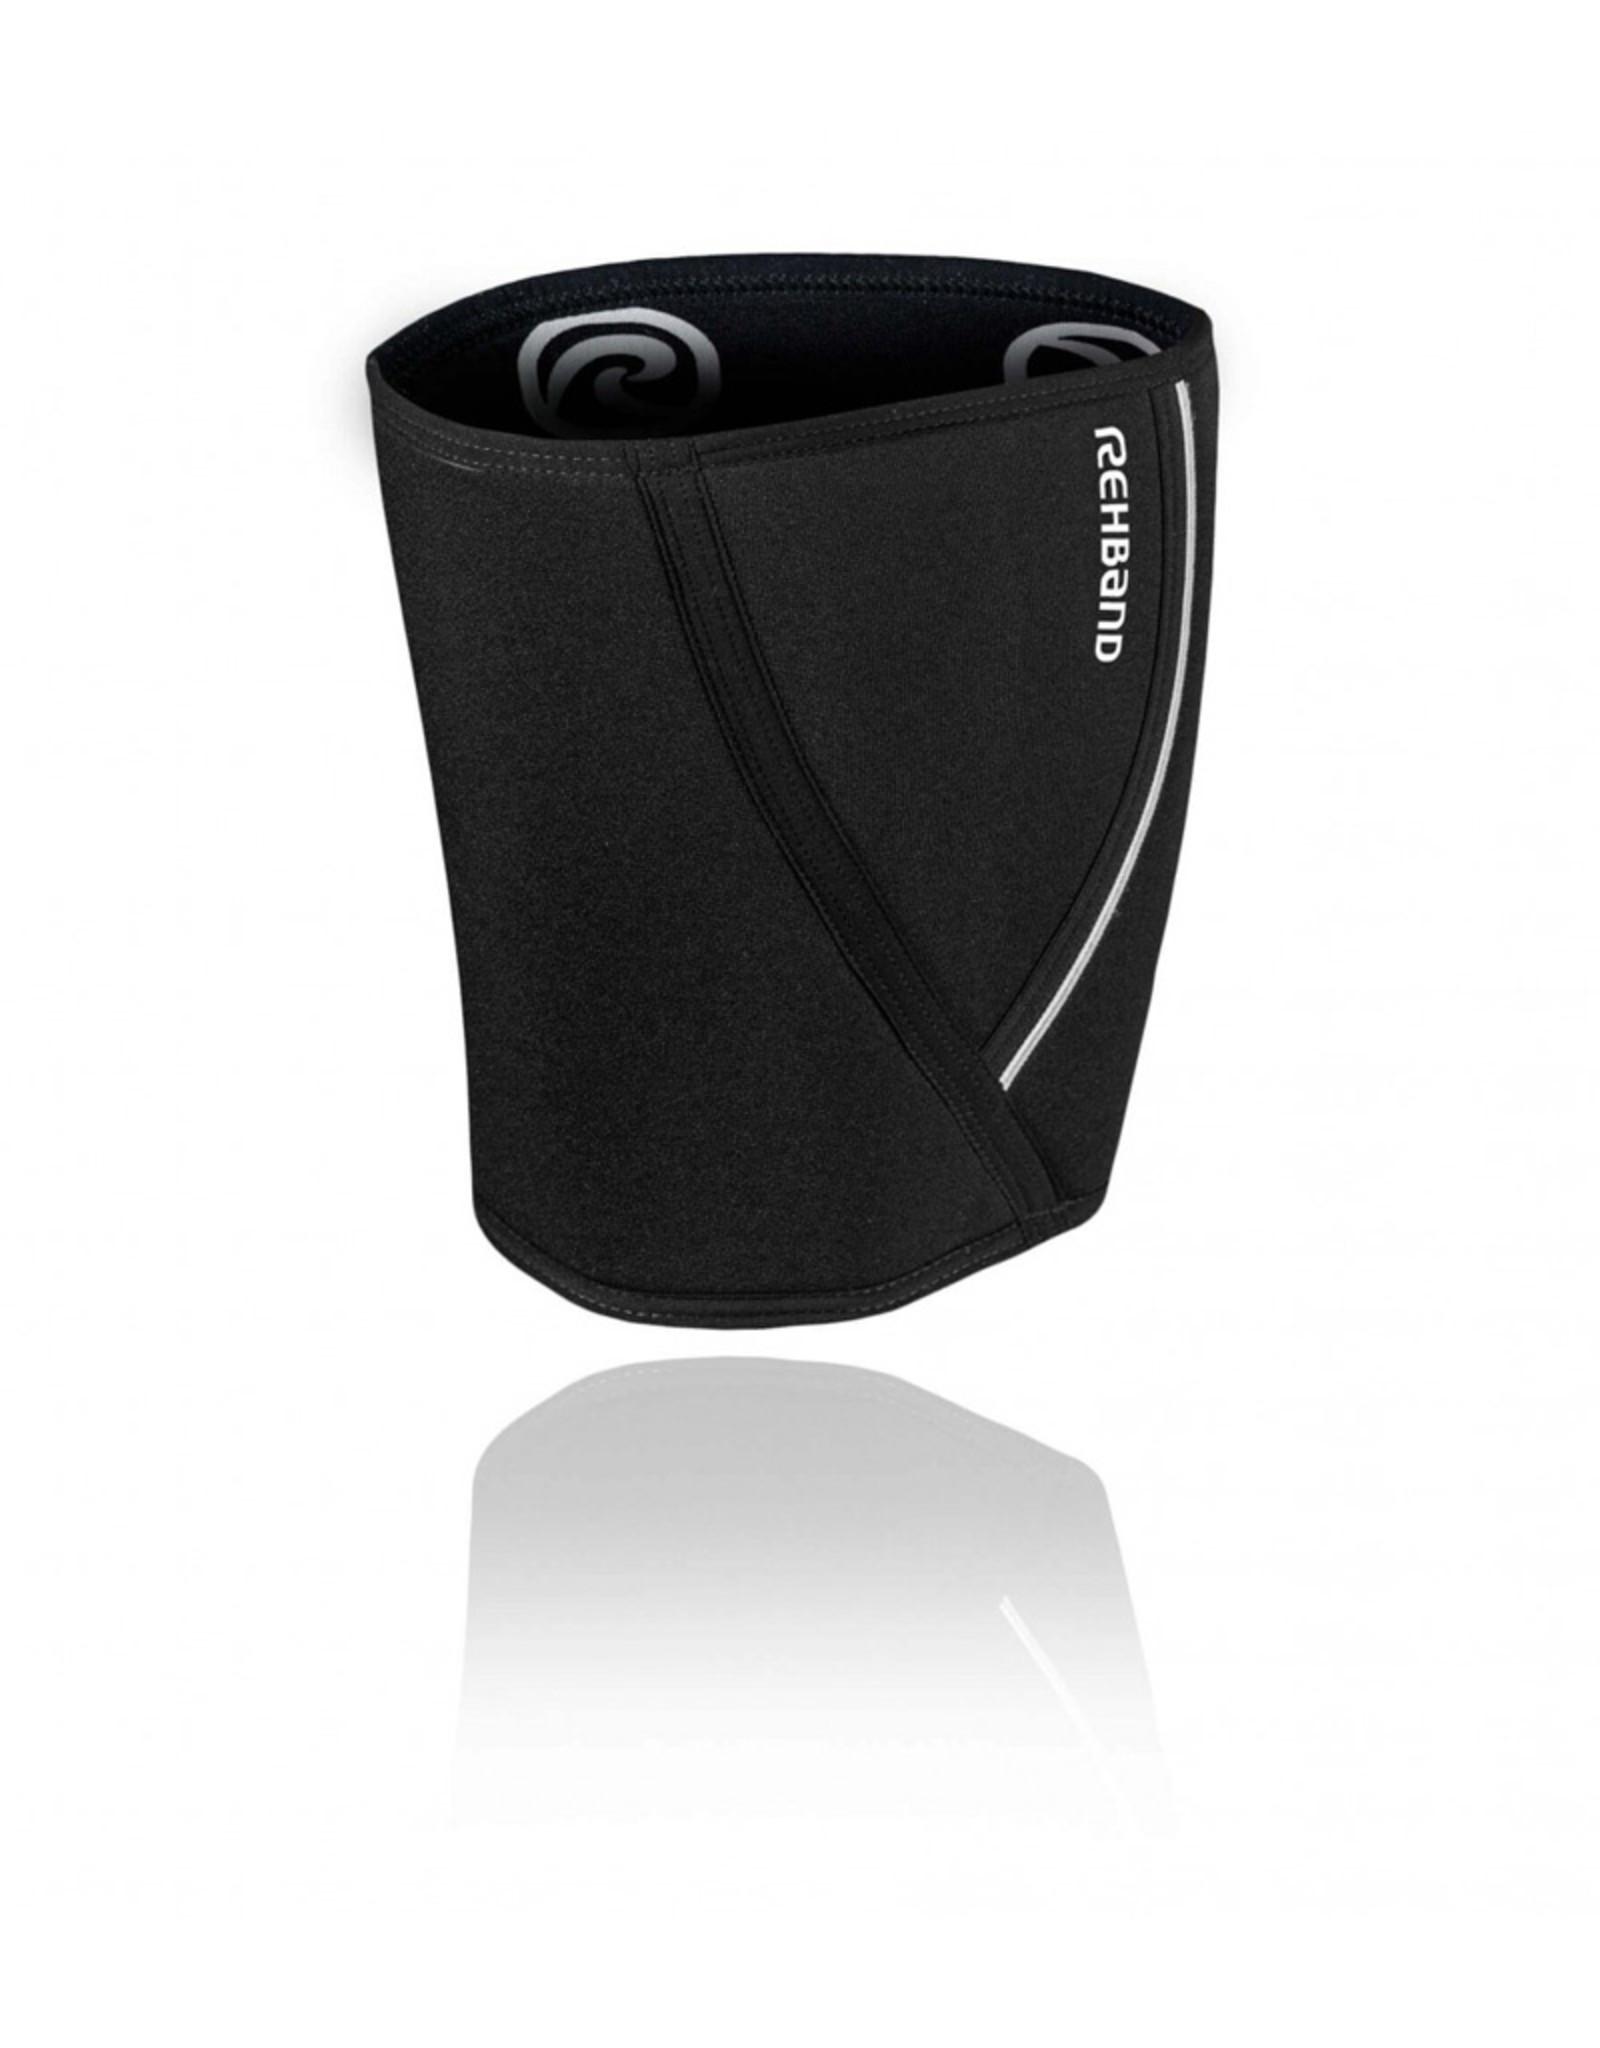 Rehband Qd Thigh Support 5Mm Dijbandage - Zwart